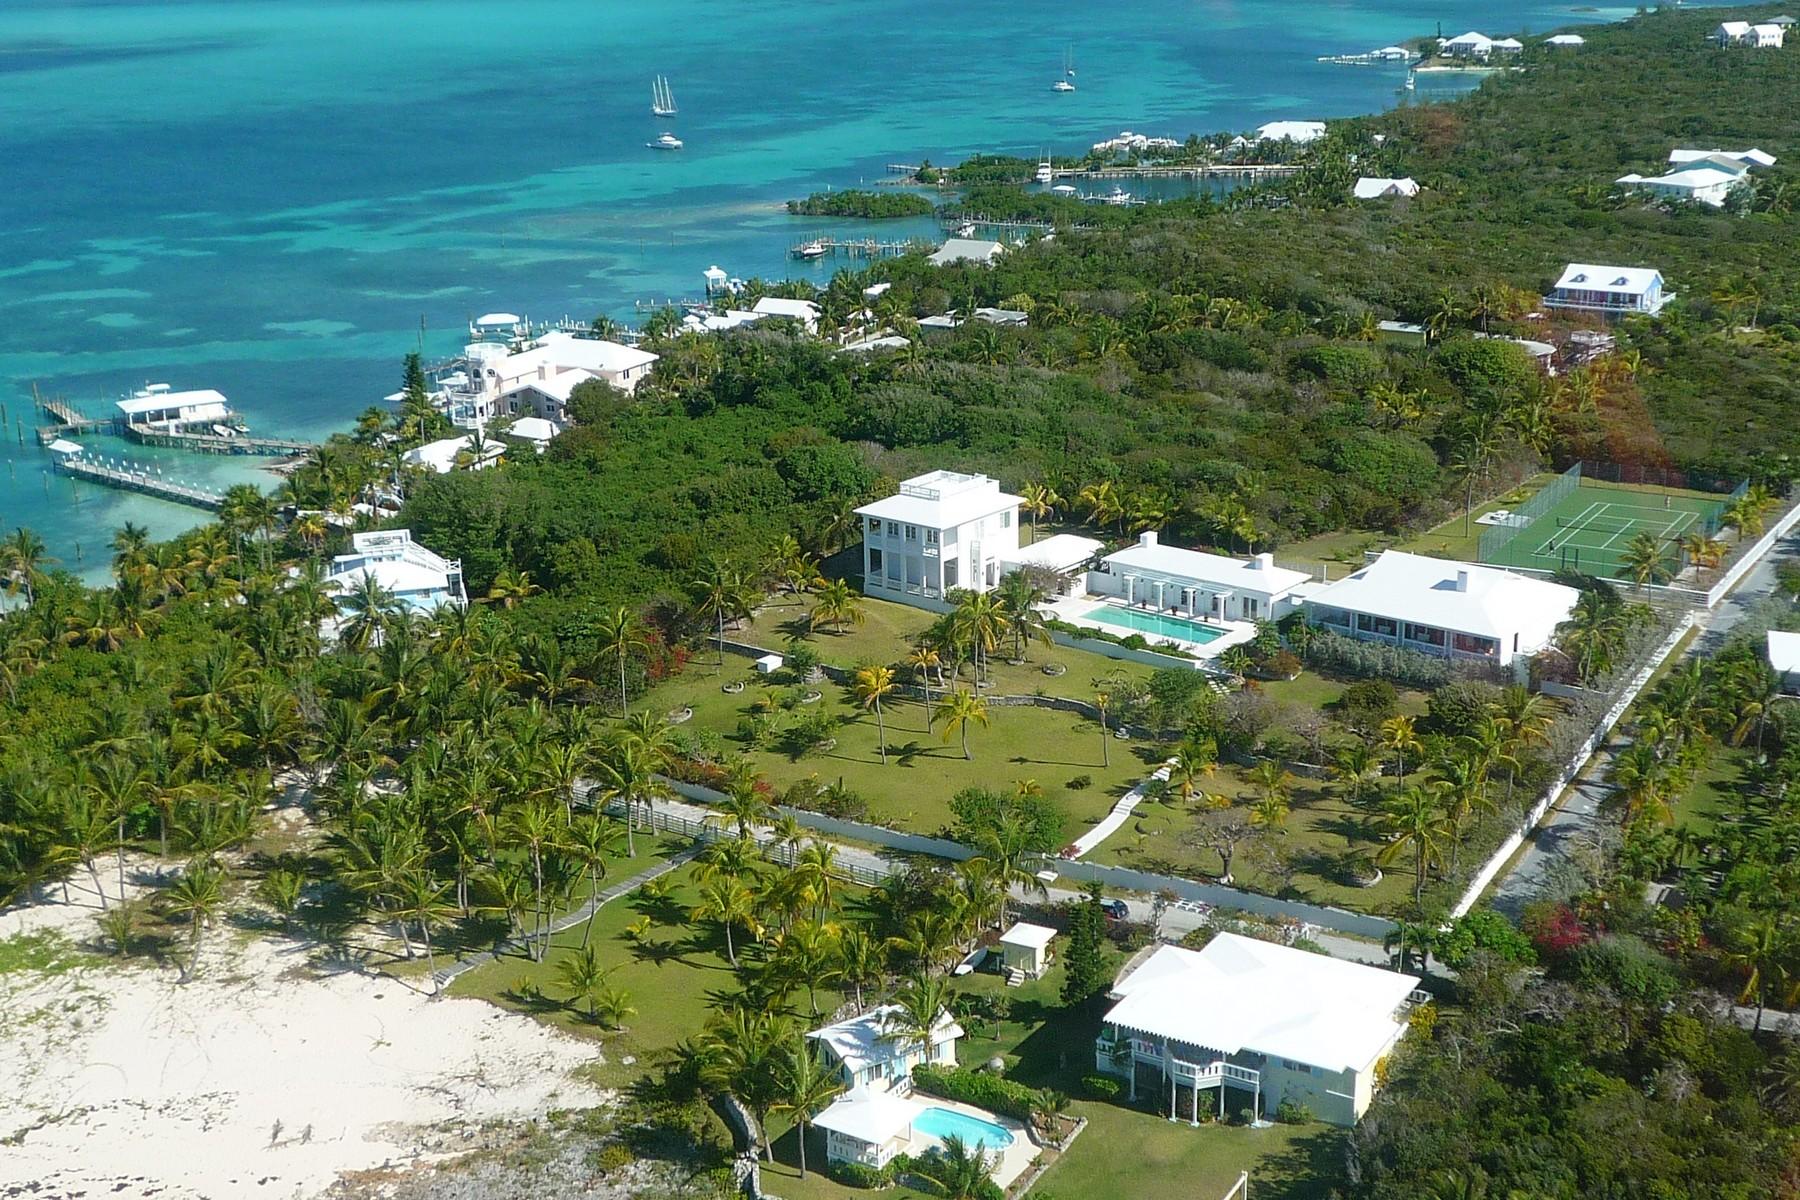 Villa per Vendita alle ore Coconut Grove Elbow Cay Hope Town, Abaco Bahamas